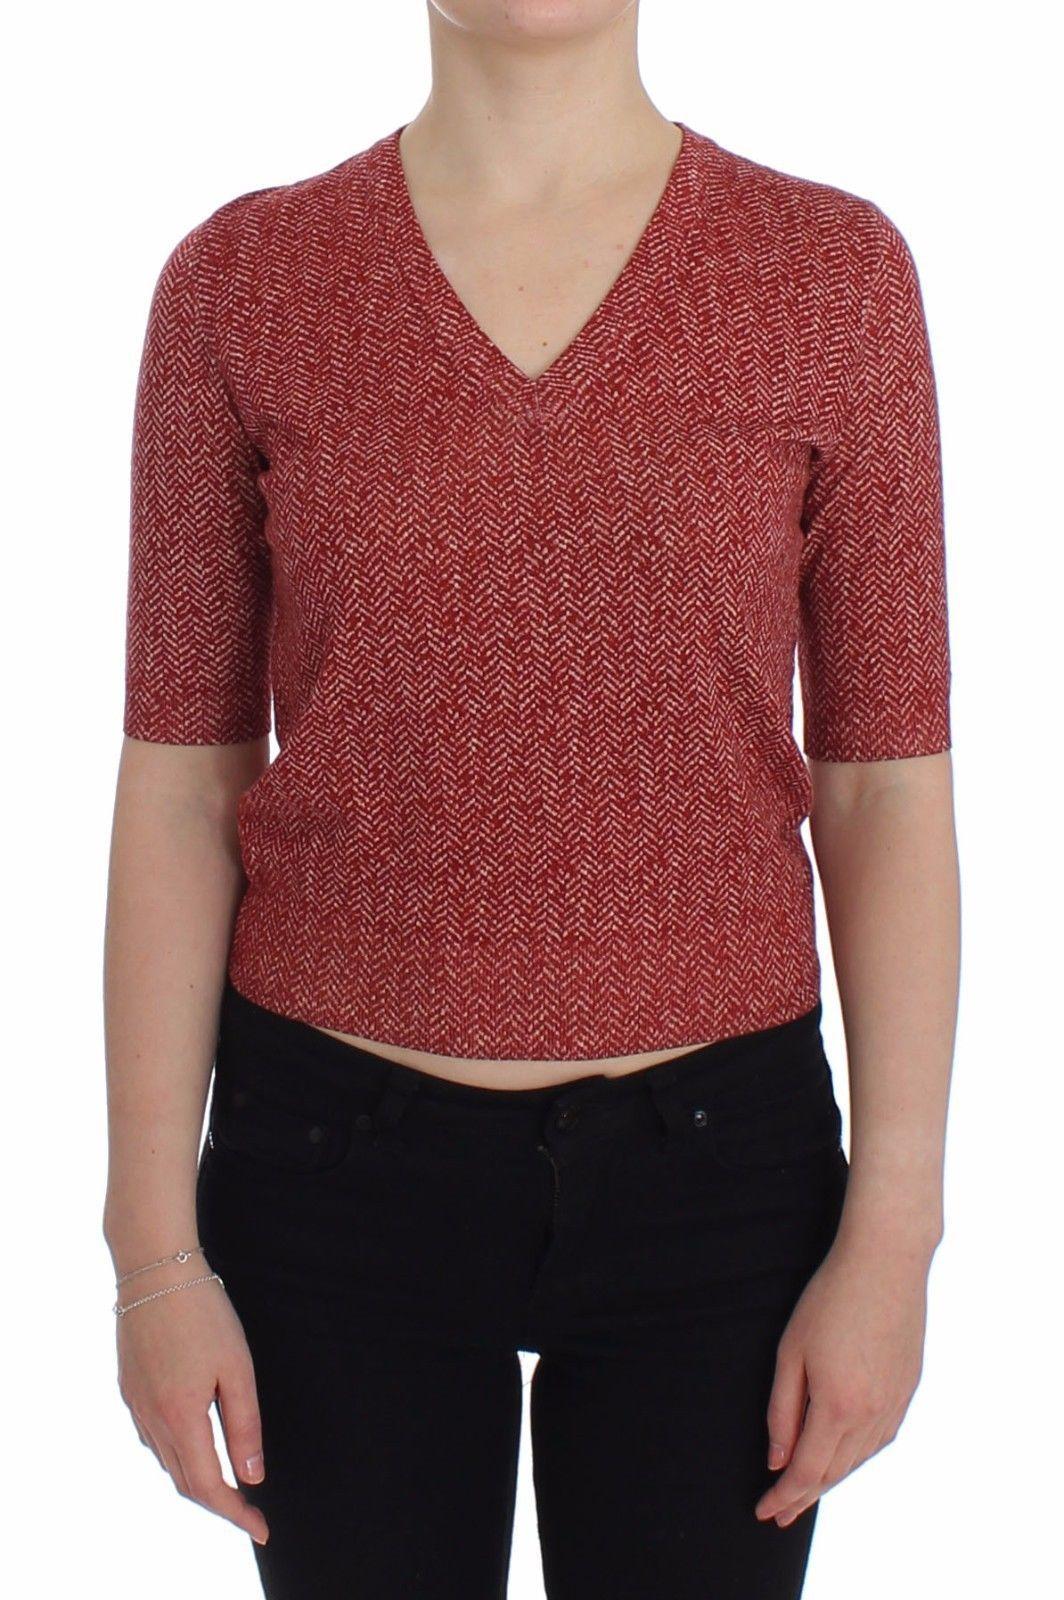 Dolce & Gabbana Women's Wool Tweed SS Sweater Red SIG13317 - IT44